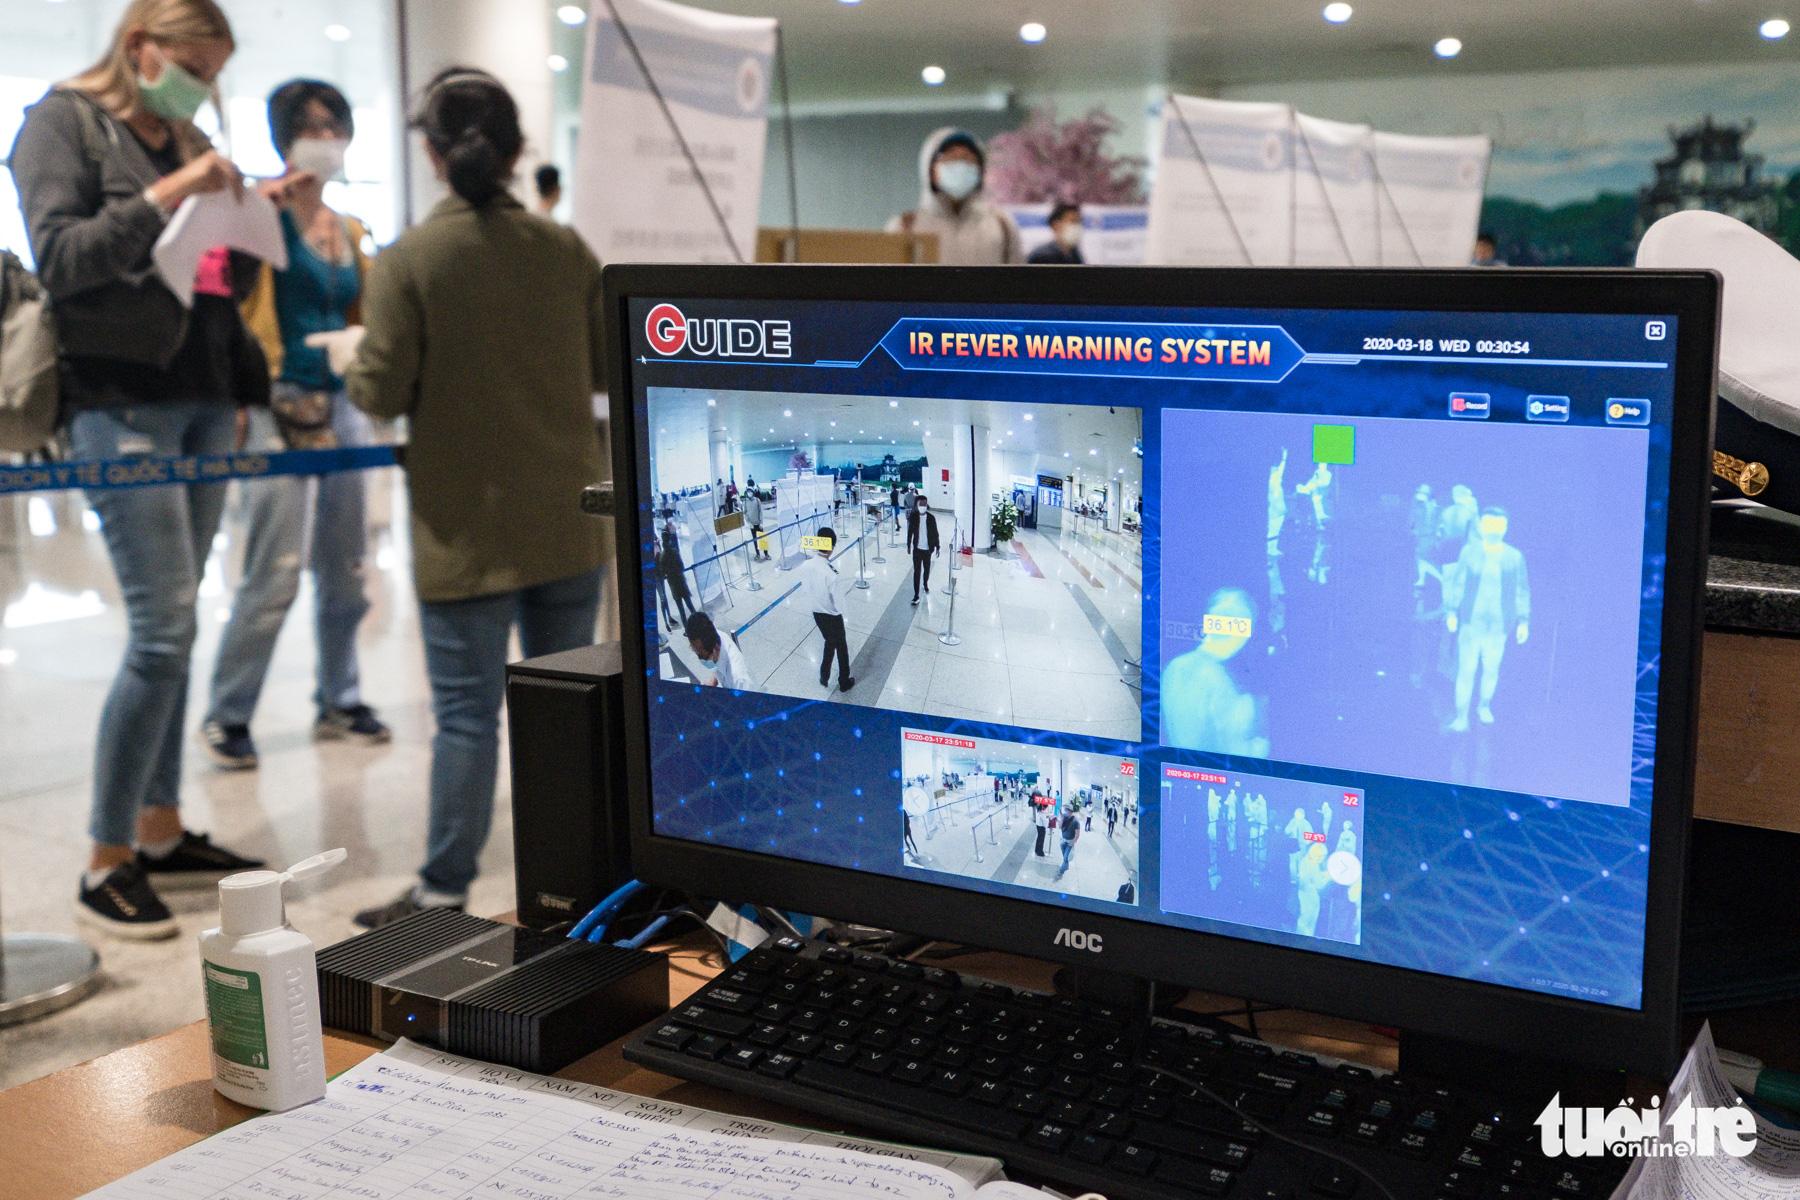 Passengers have their body temperature monitored at Noi Bai International Airport in Hanoi, Vietnam, March 18, 2020. Photo: Nam Tran / Tuoi Tre